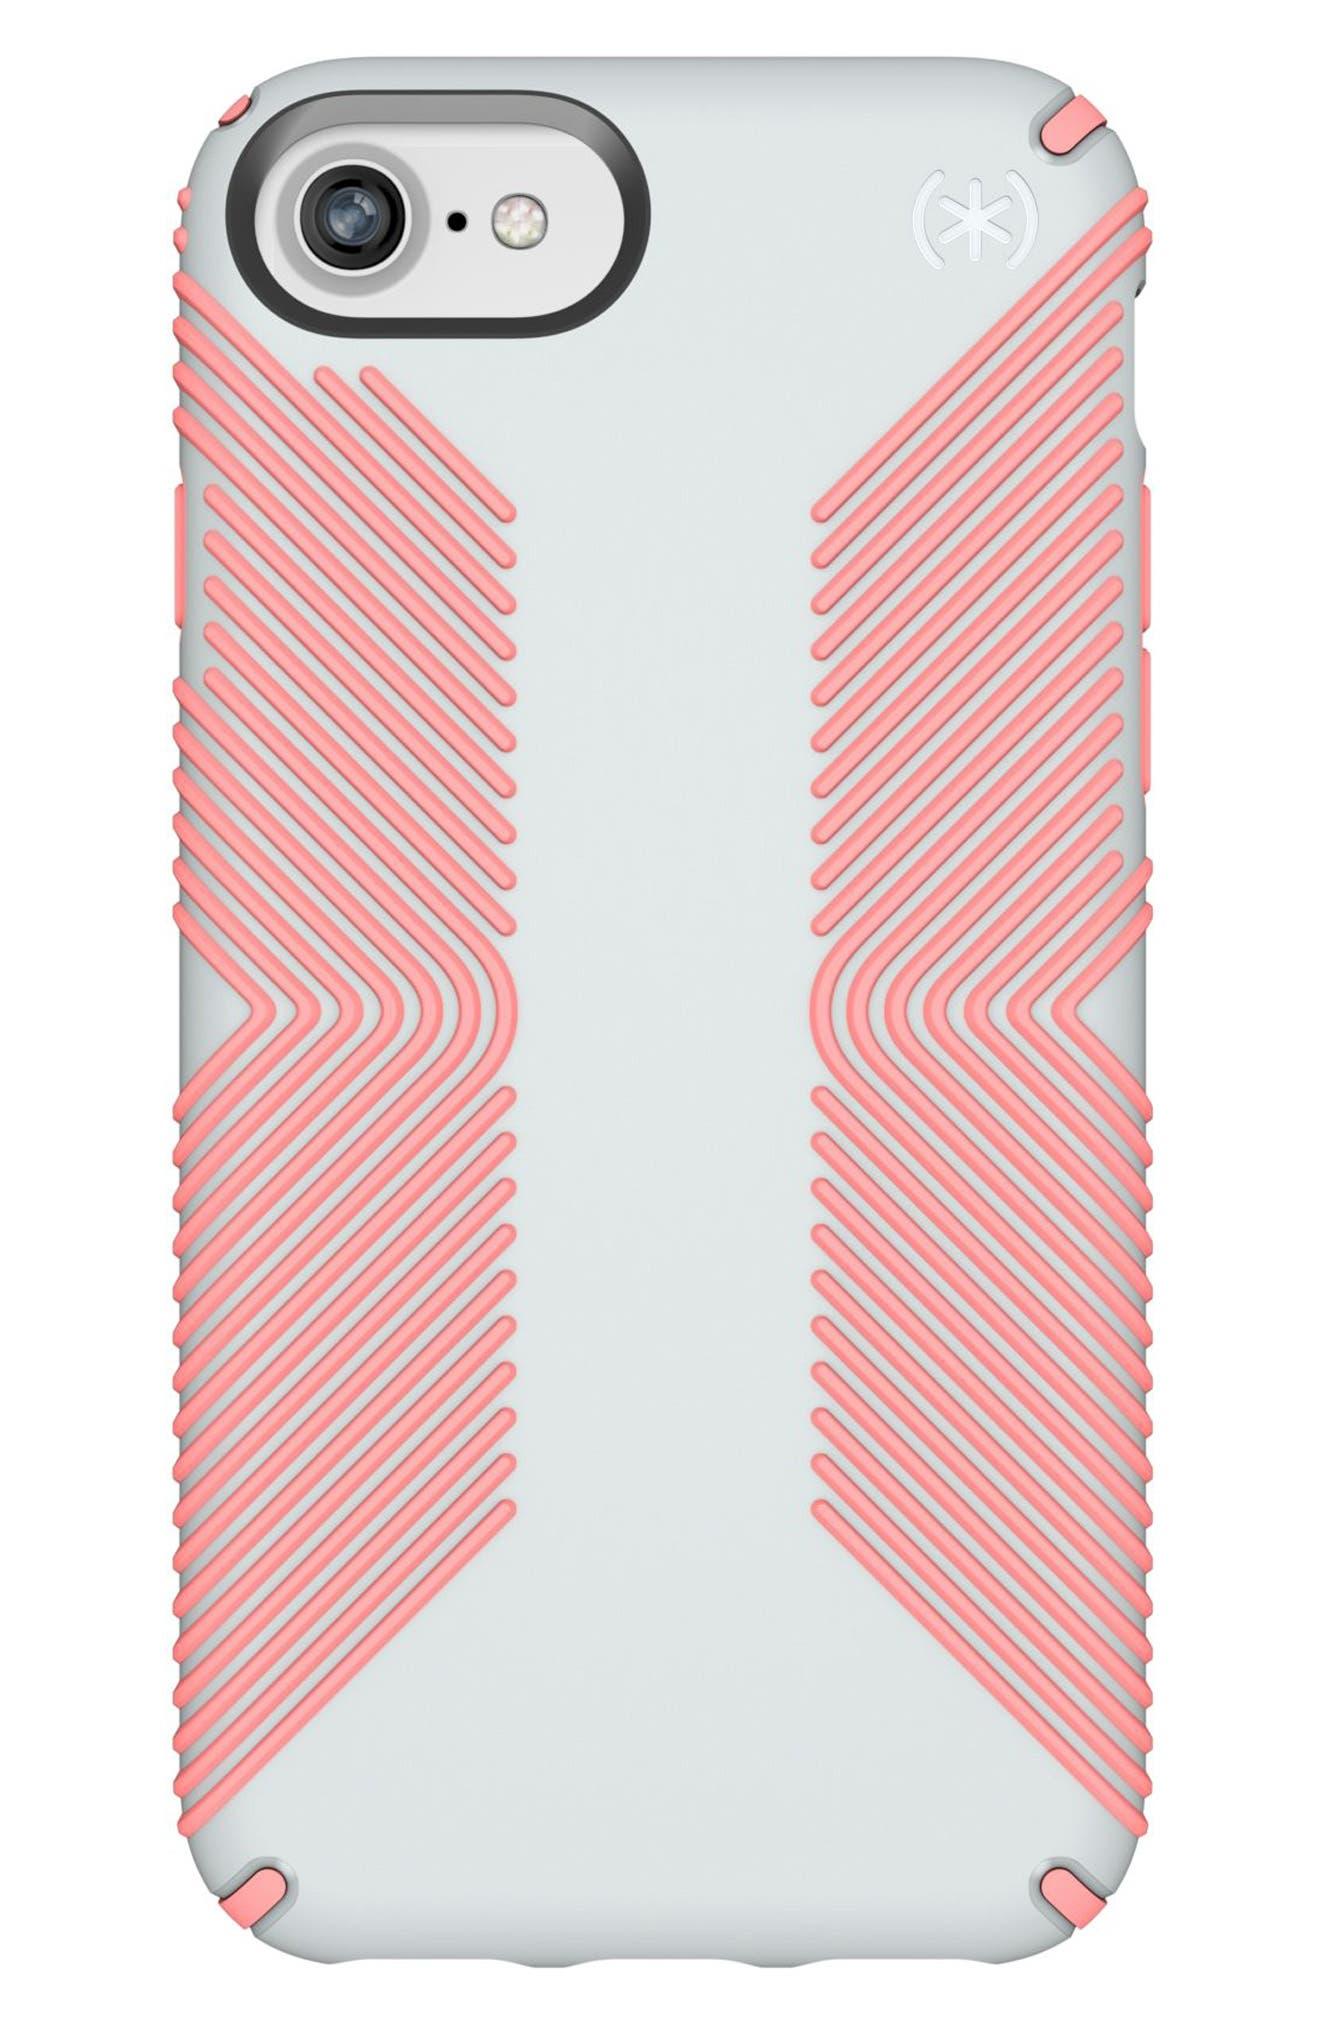 Grip iPhone 6/6s/7/8 Case,                         Main,                         color, 020